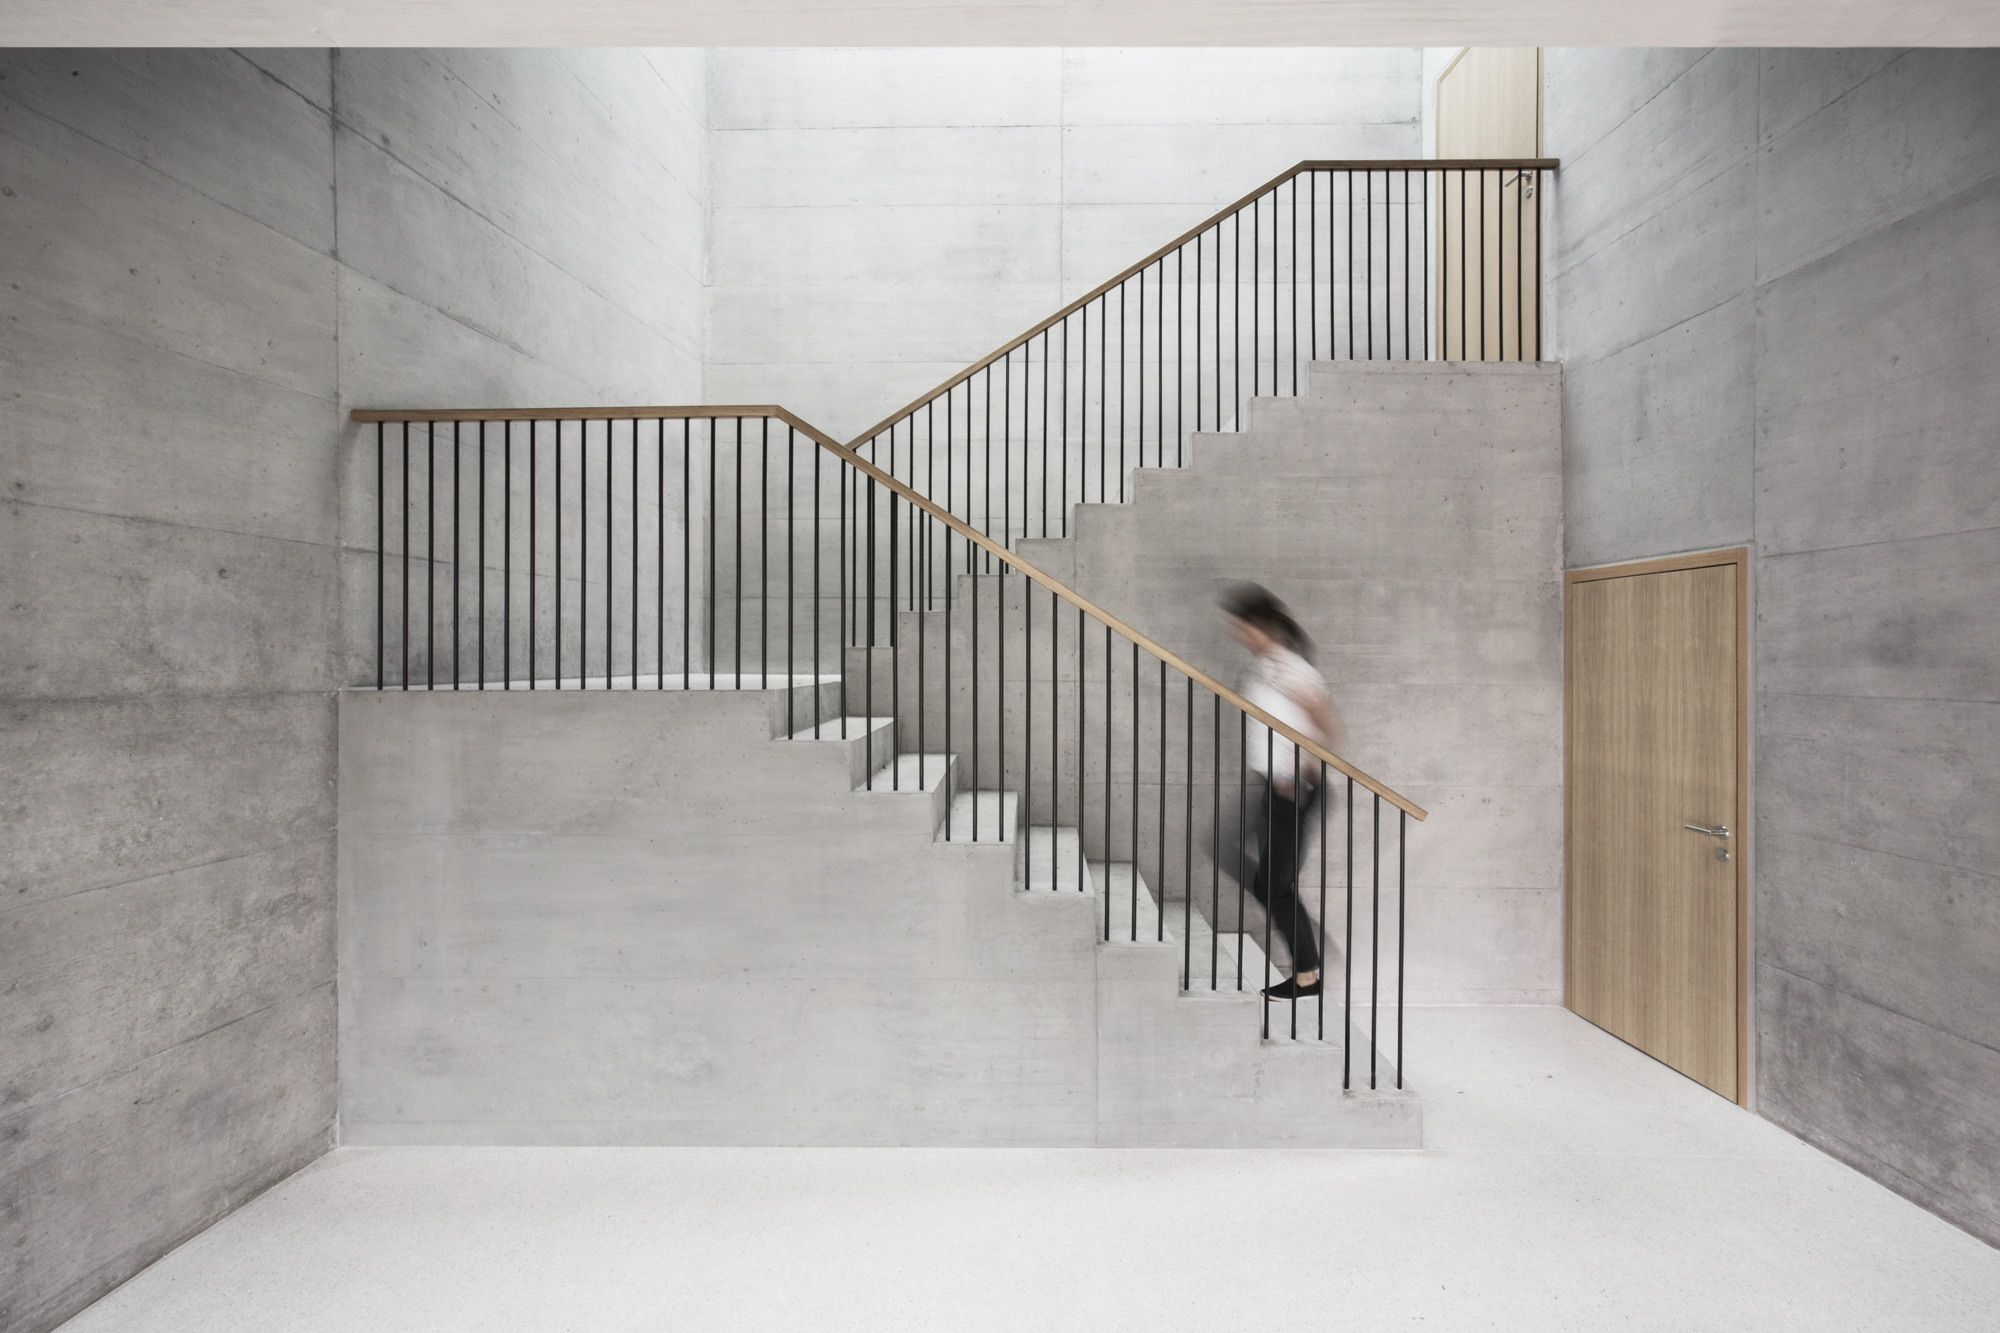 Plissierter Beton - Bürobau bei Lausanne   Lausanne, Architecture ...